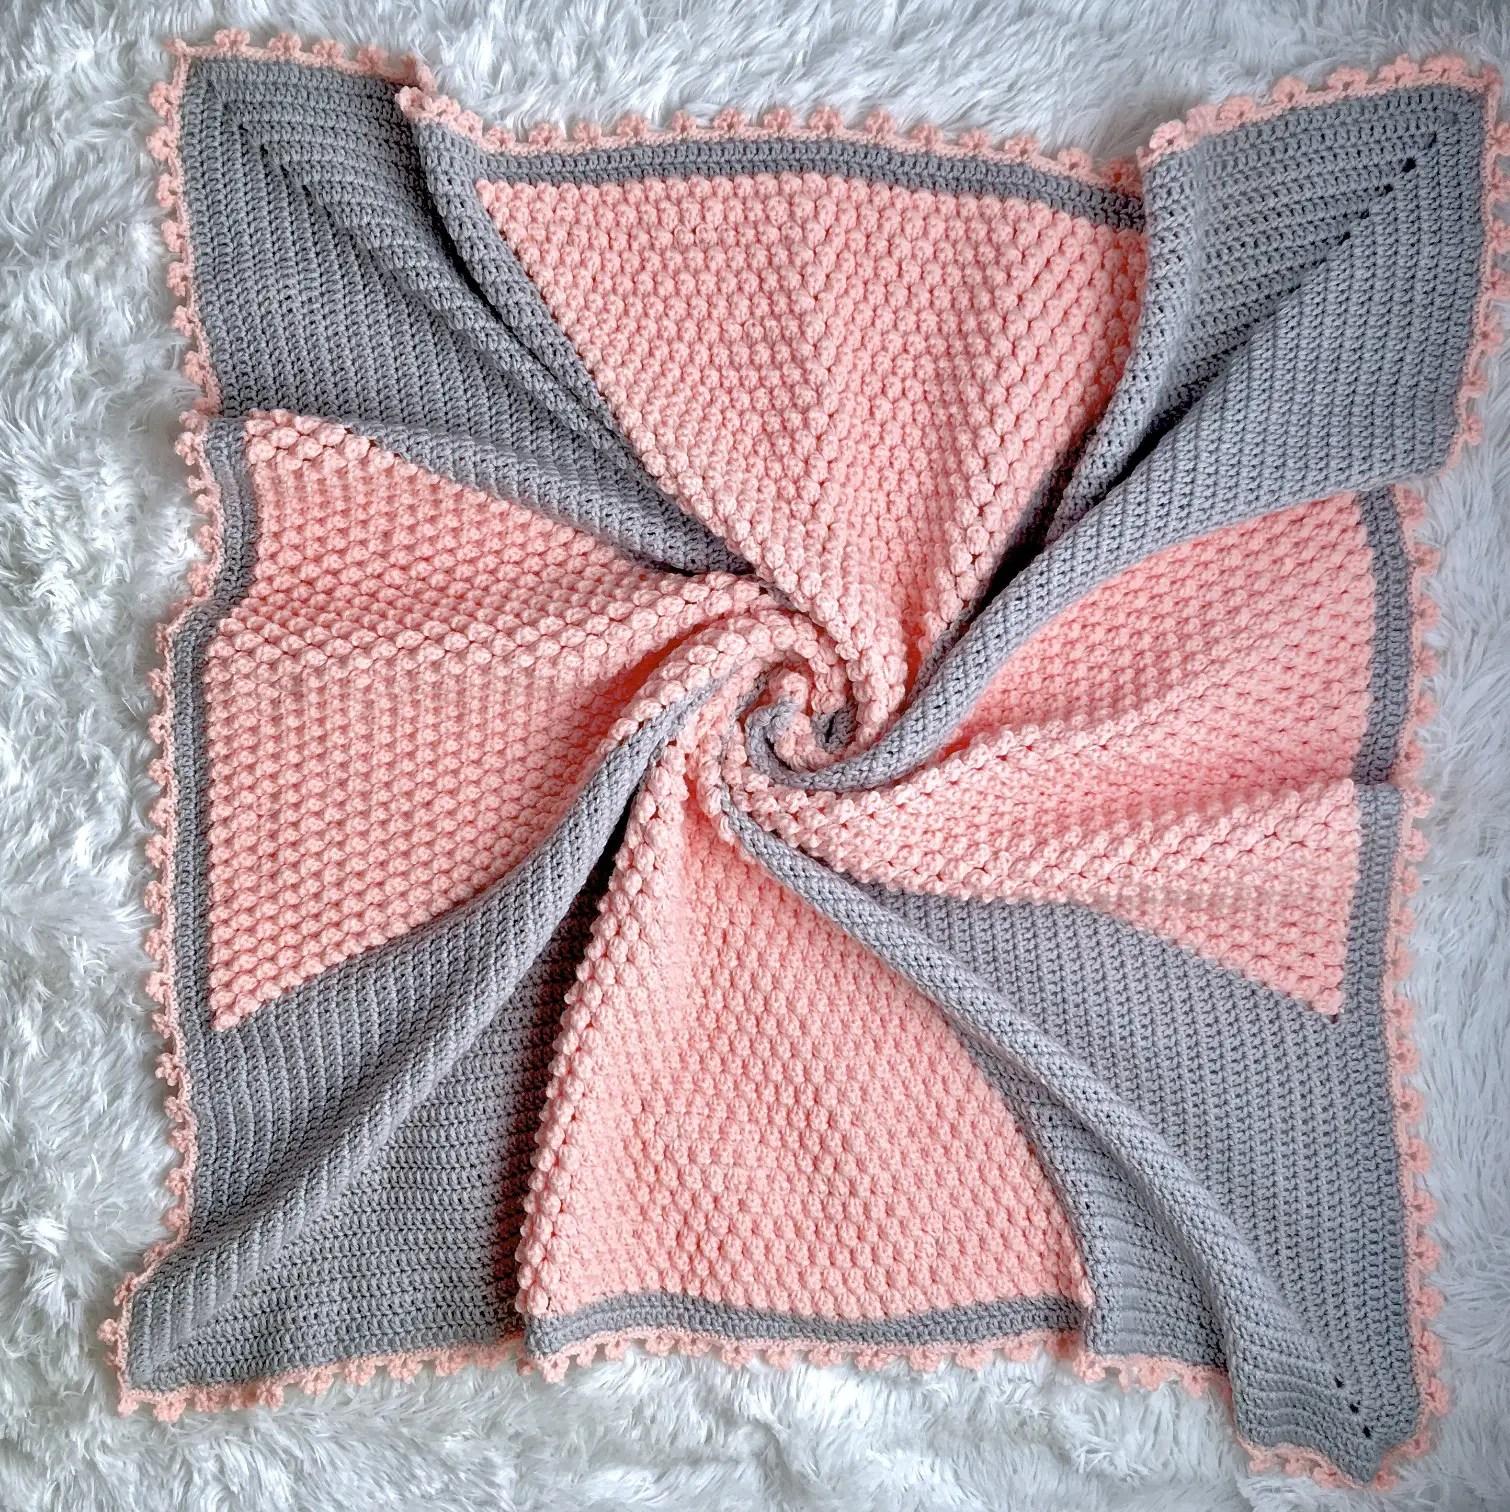 2a825b897ca2 Cross My Heart Baby Blanket Free Crochet Pattern - Nana s Crafty Home